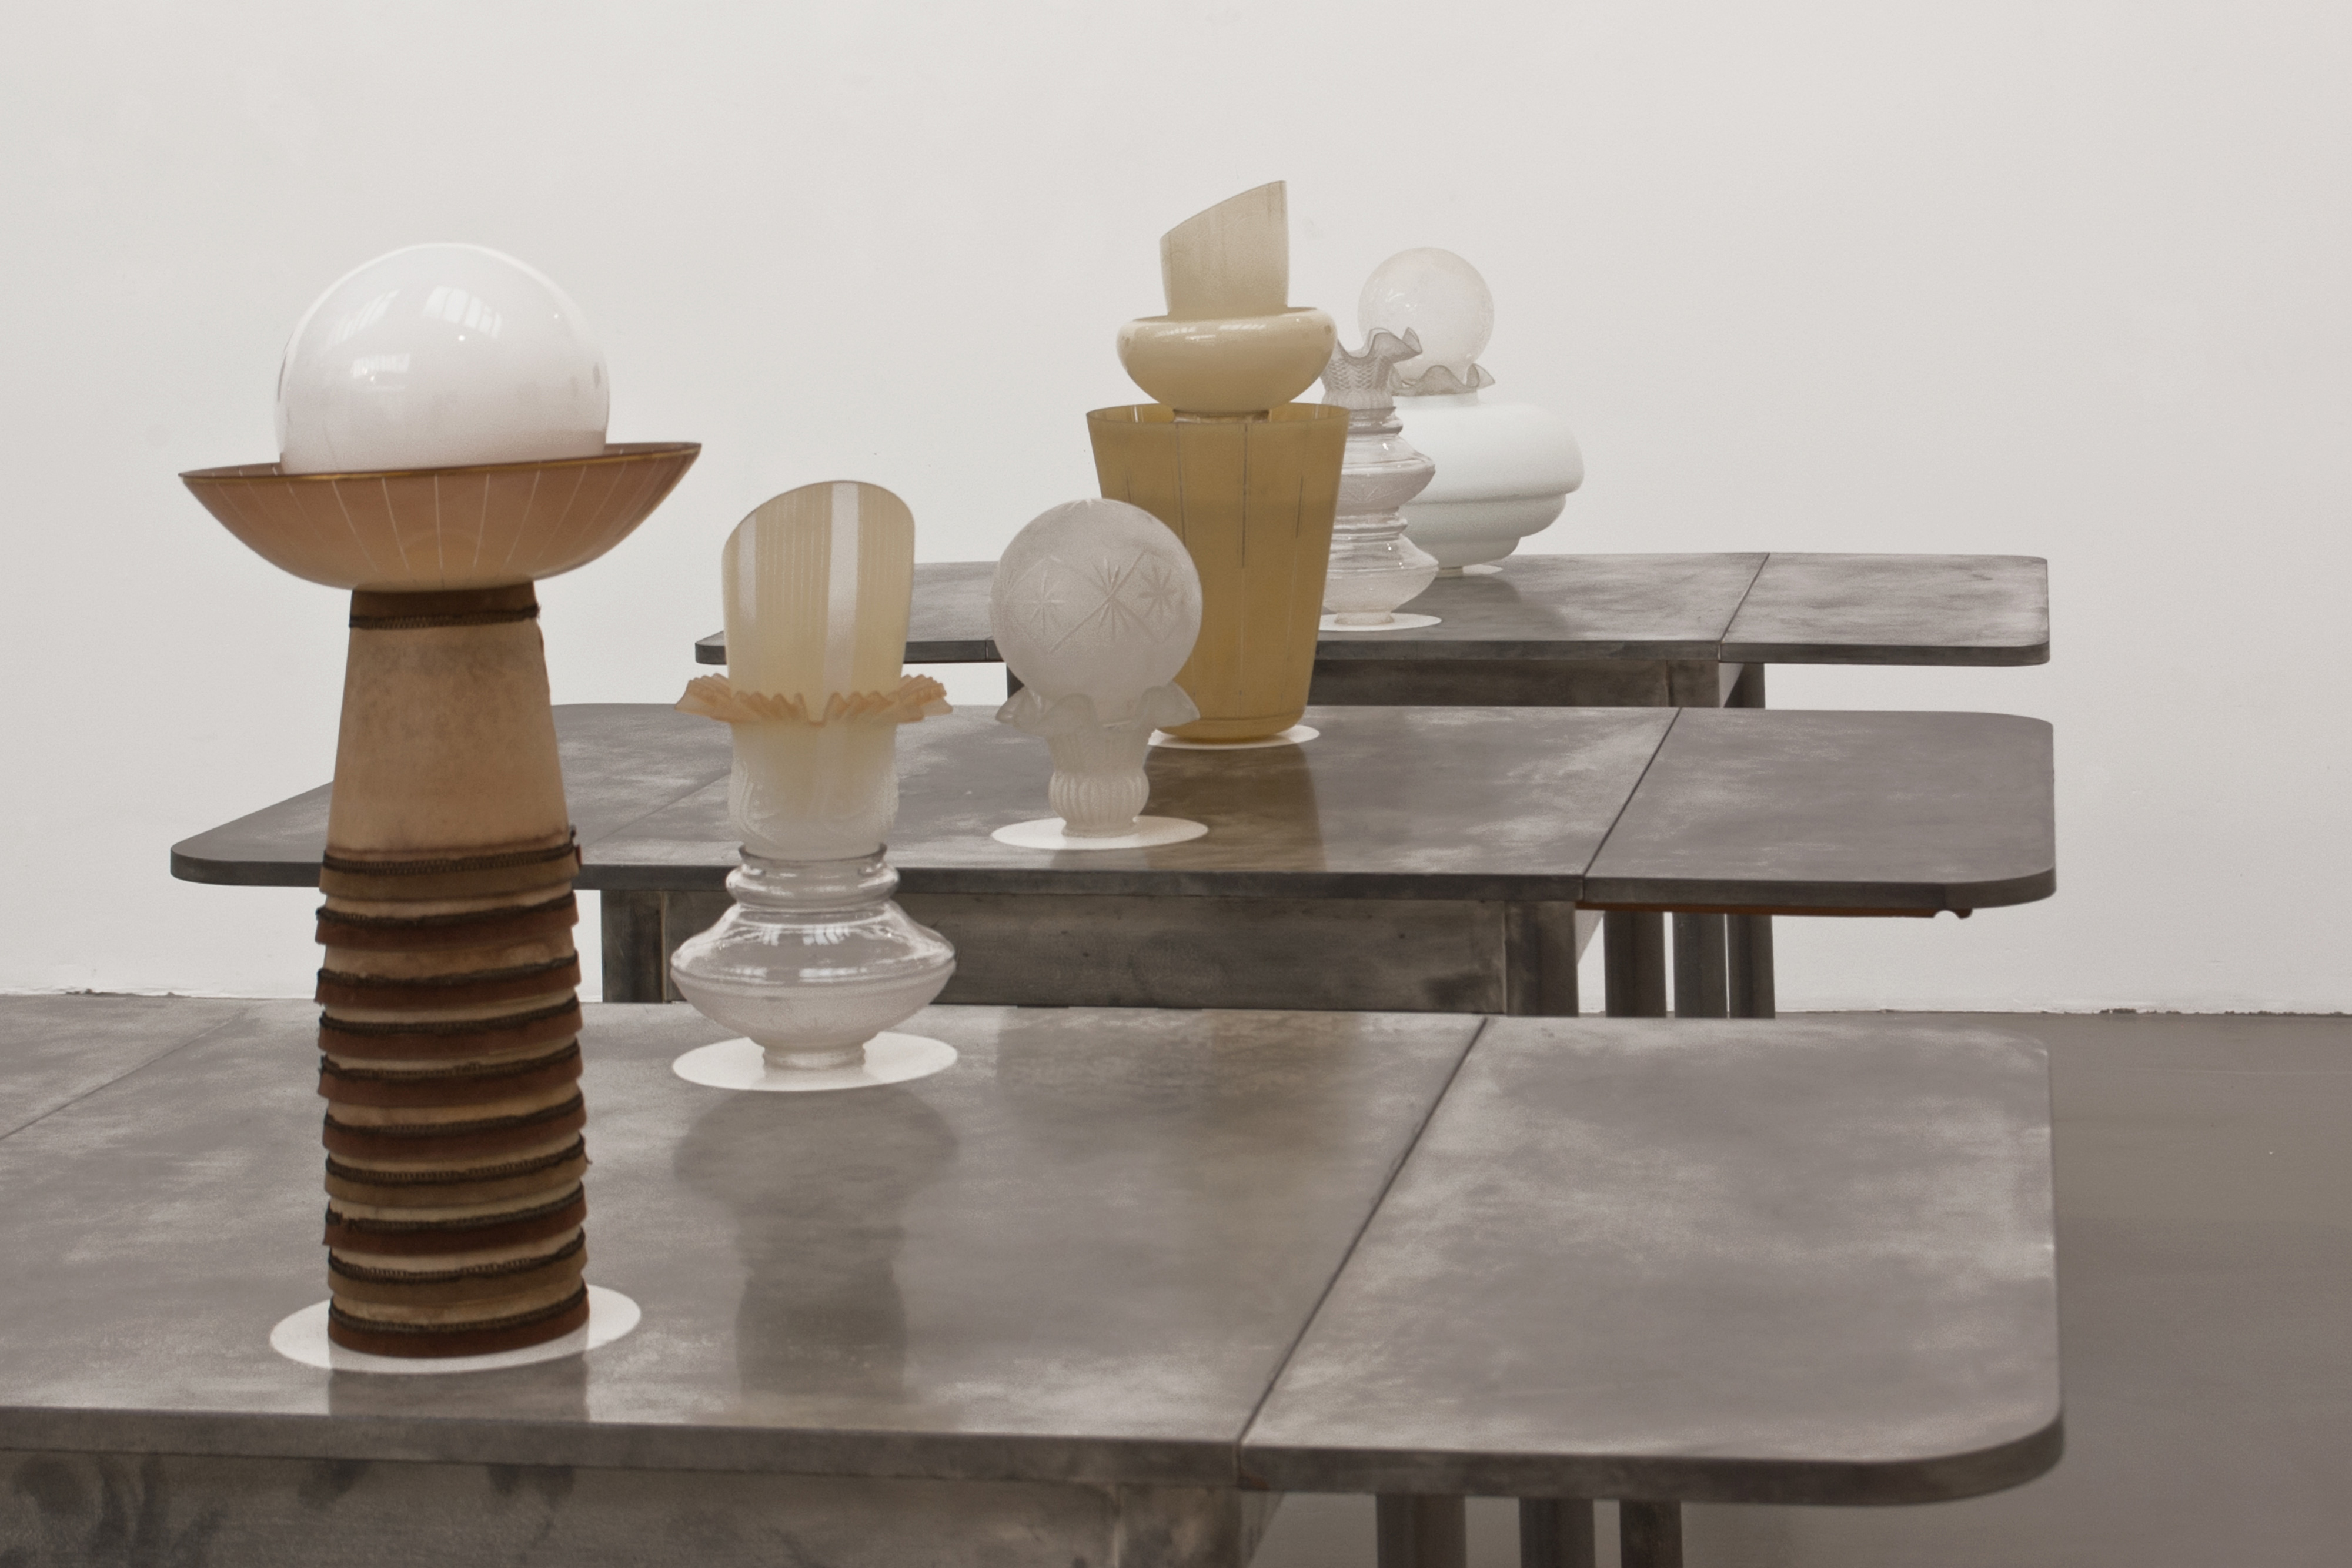 Galerie Barbara Thumm \ Fiona Banner, Marcus Becker, Diango Hernández – Group show